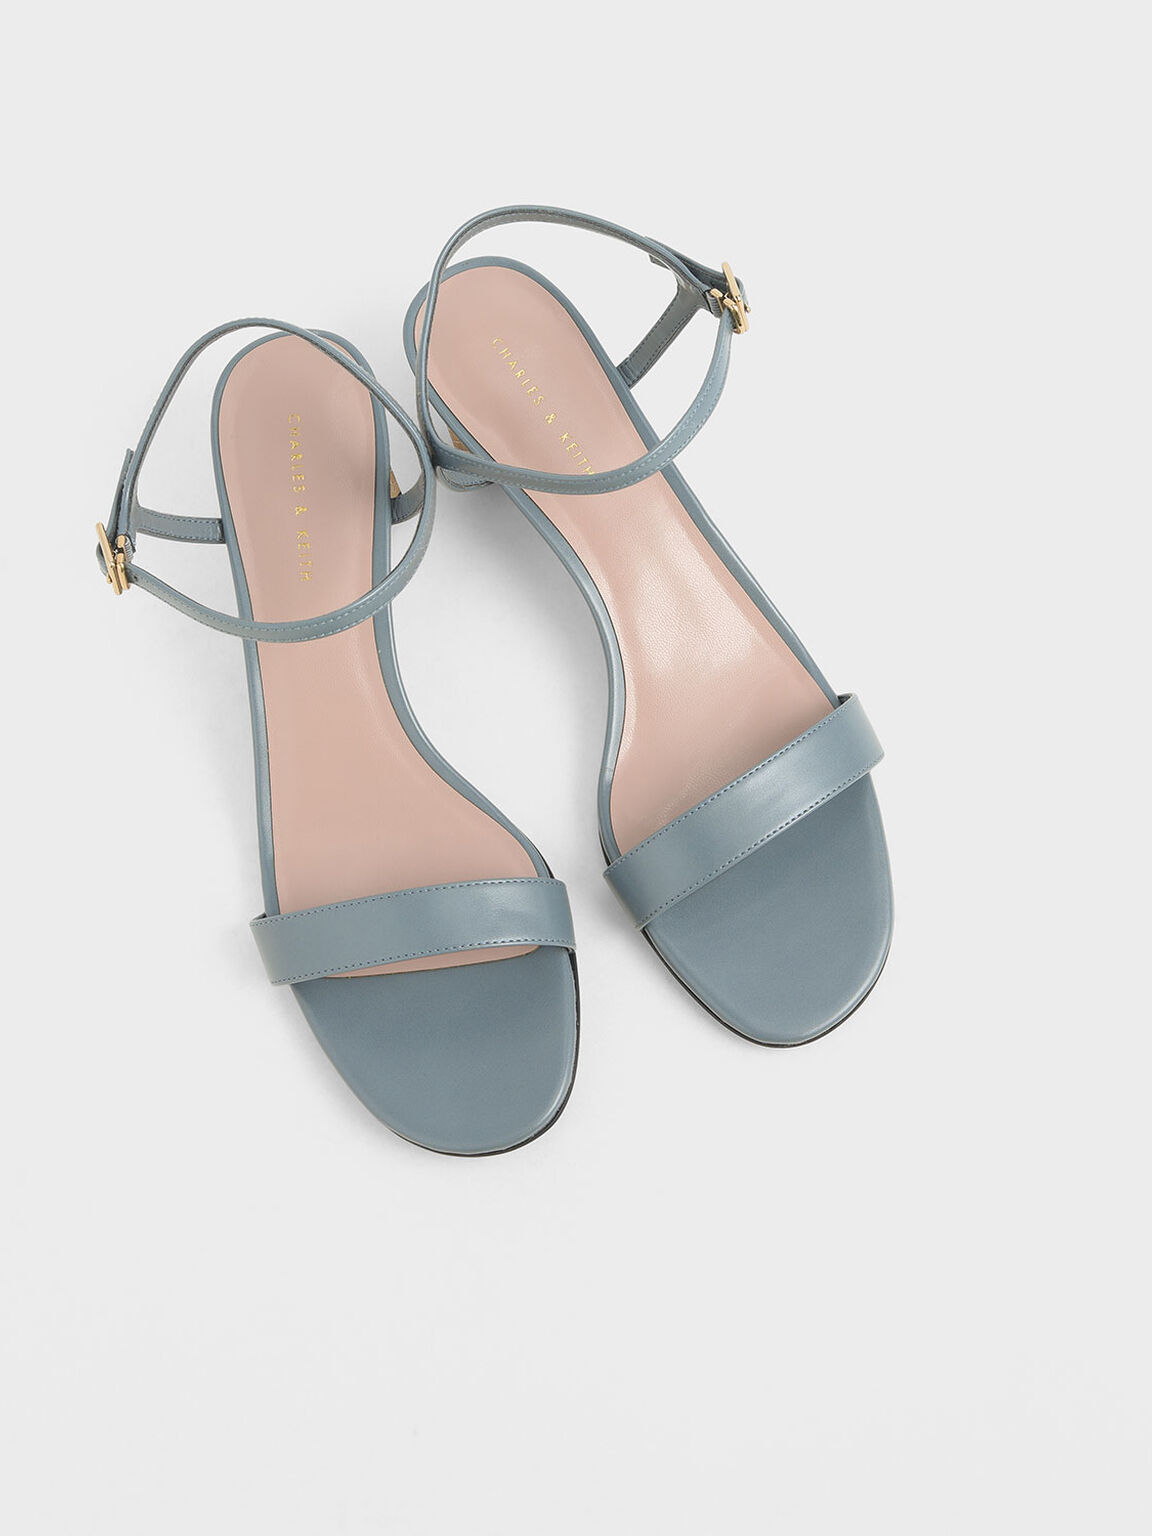 Sculptural Chrome Heel Sandals, Blue, hi-res